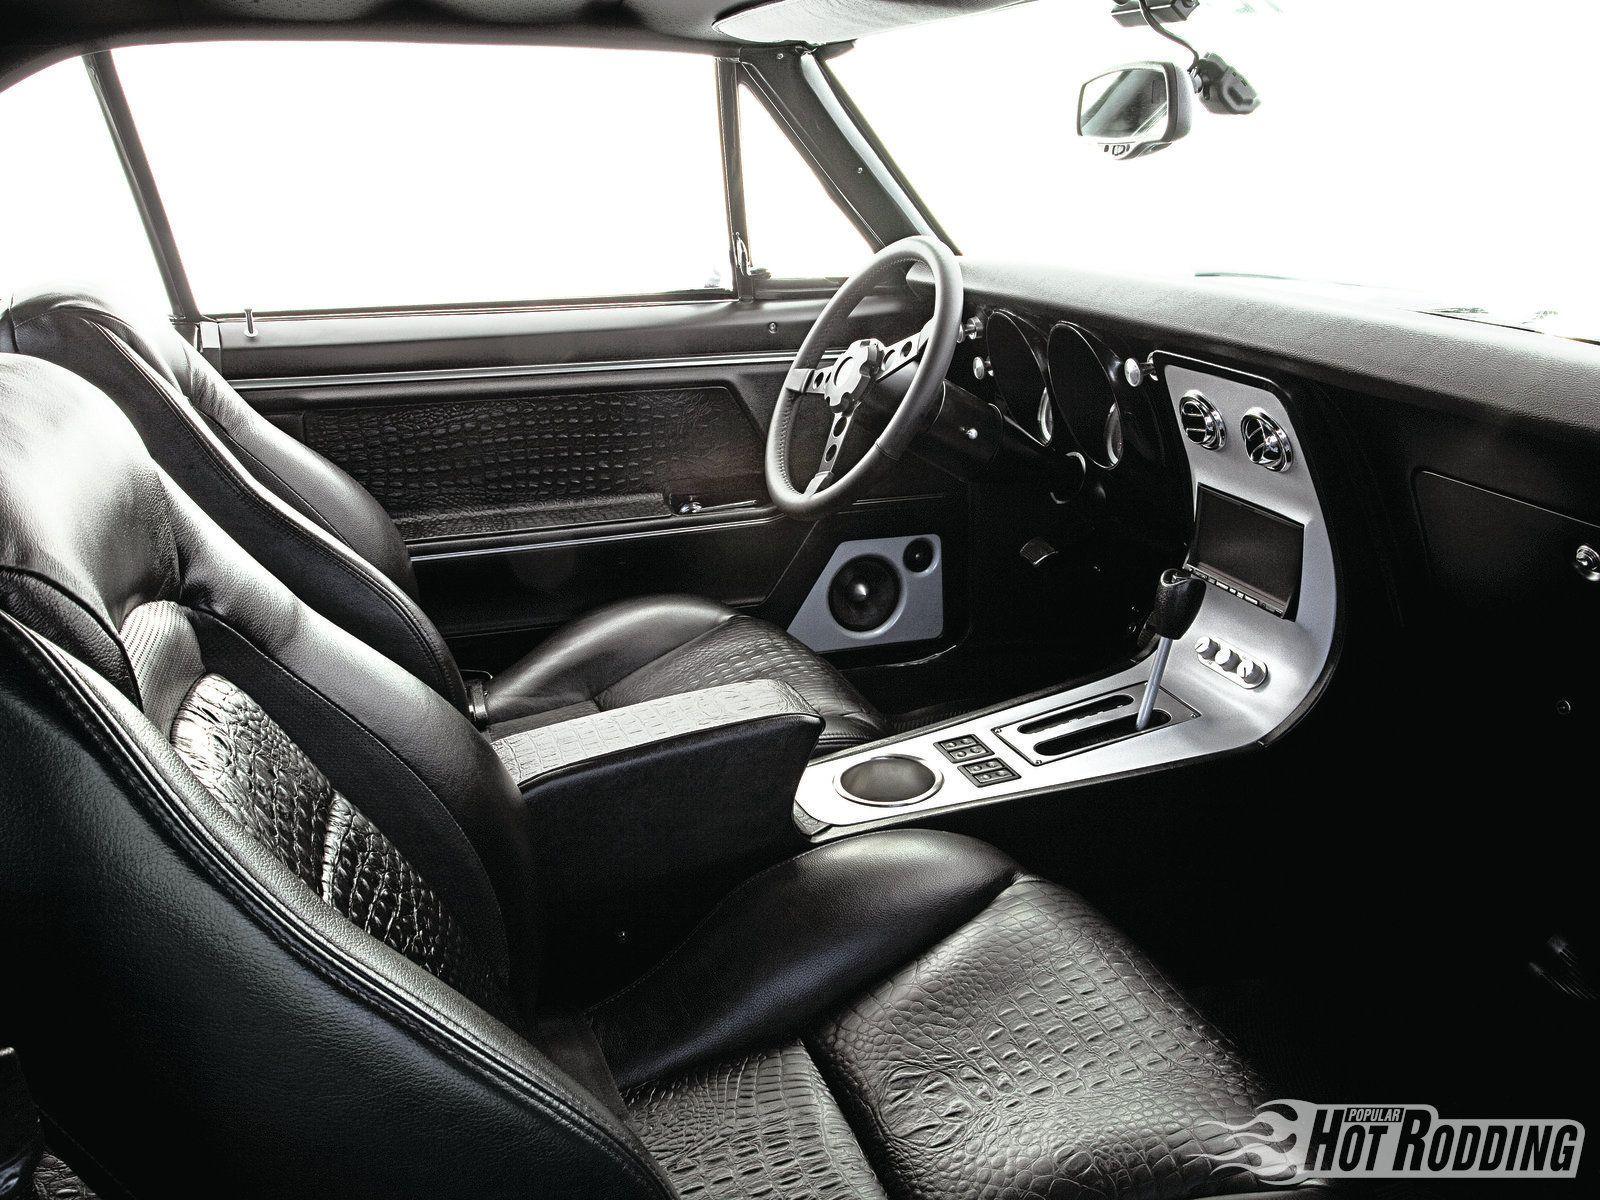 1967 Pontiac Firebird Black Leather Interior Photo 3 Pontiac Firebird Hot Rods Cars Muscle Pontiac